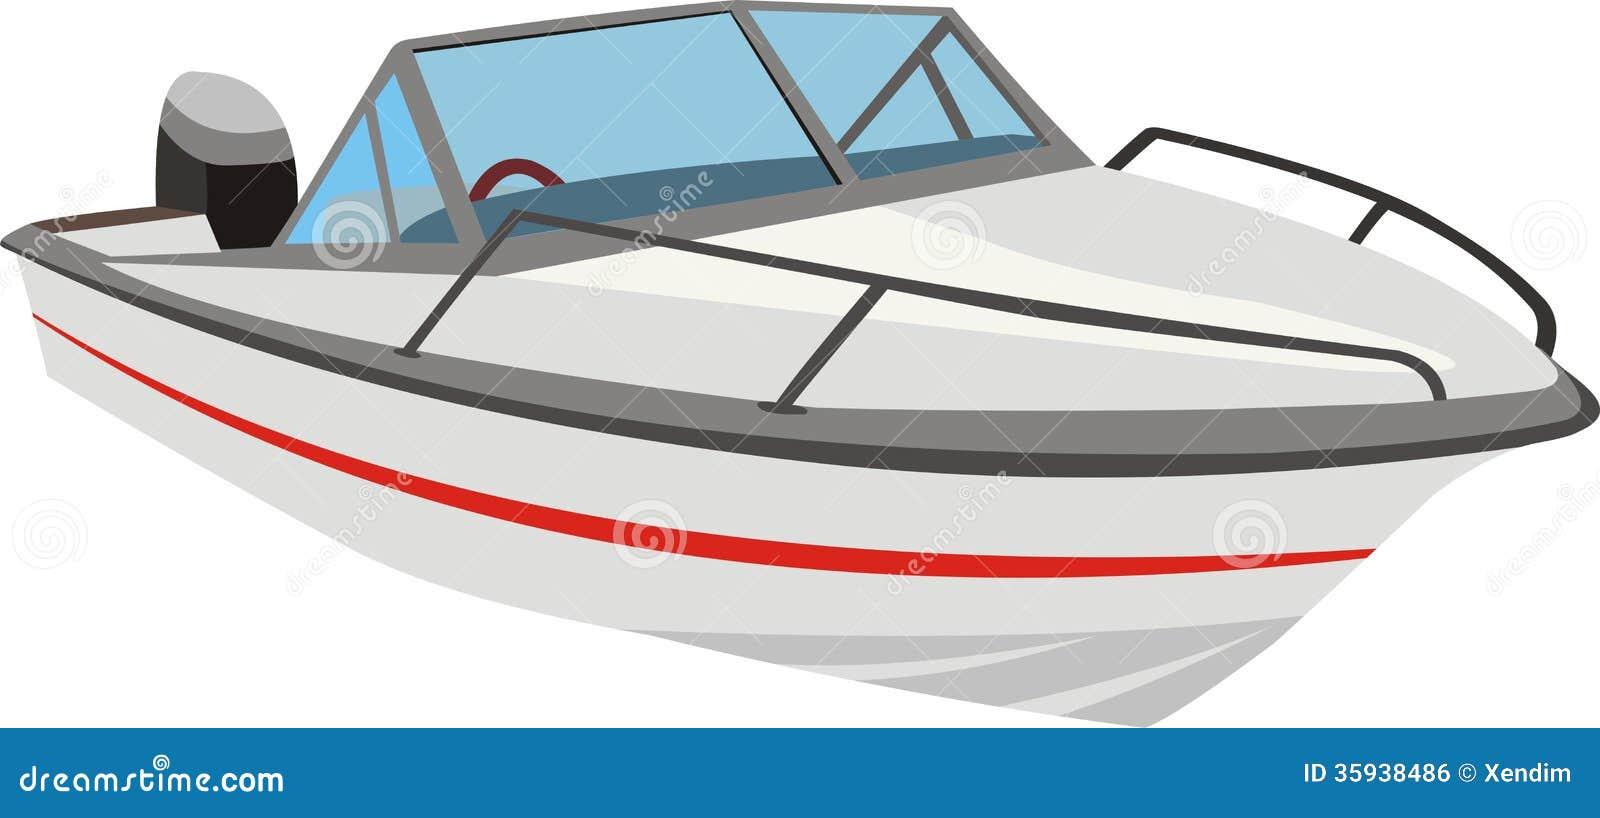 Cartoon Outboard Motors : Speedboat or motorboat stock vector illustration of